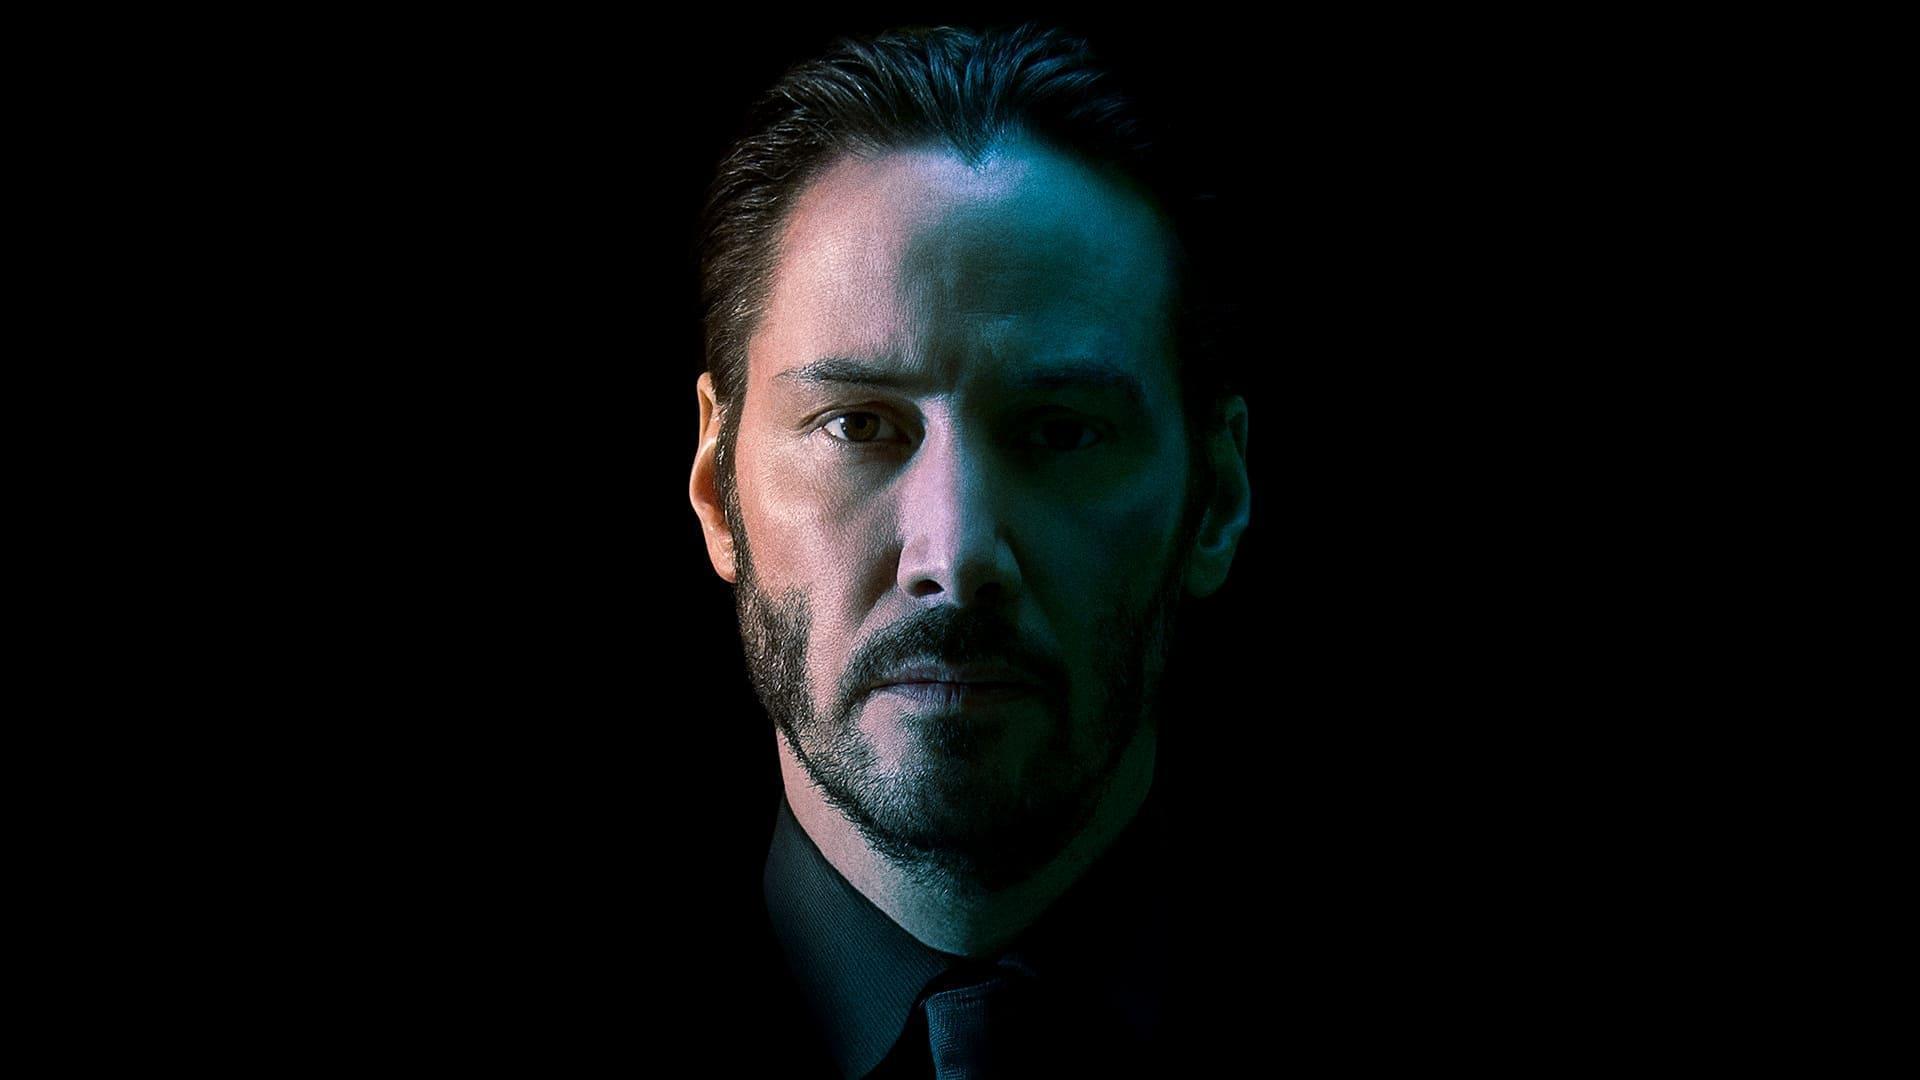 John Wick 4 John Wick | John Wick: Chapter 4 | Keanu Reeves John Wick, John Wick: Chapter 4, Keanu Reeves, ΣΙΝΕΜΑ